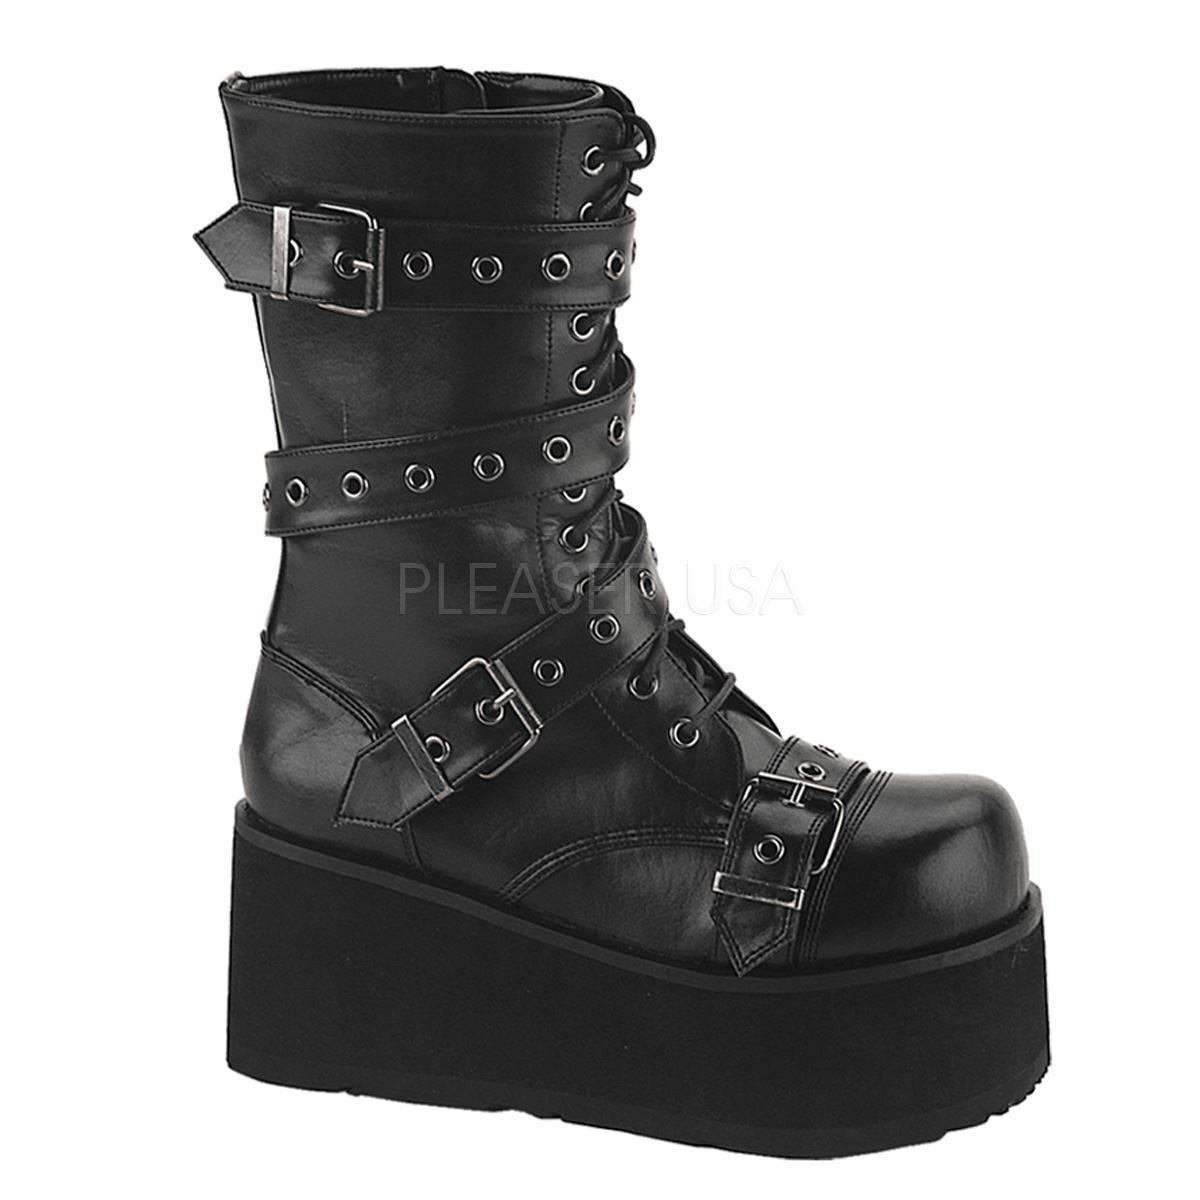 Demonia trashville-205 Platform goth Avvolgere punk VITELLO Boot Con Avvolgere goth Cinturino Nero